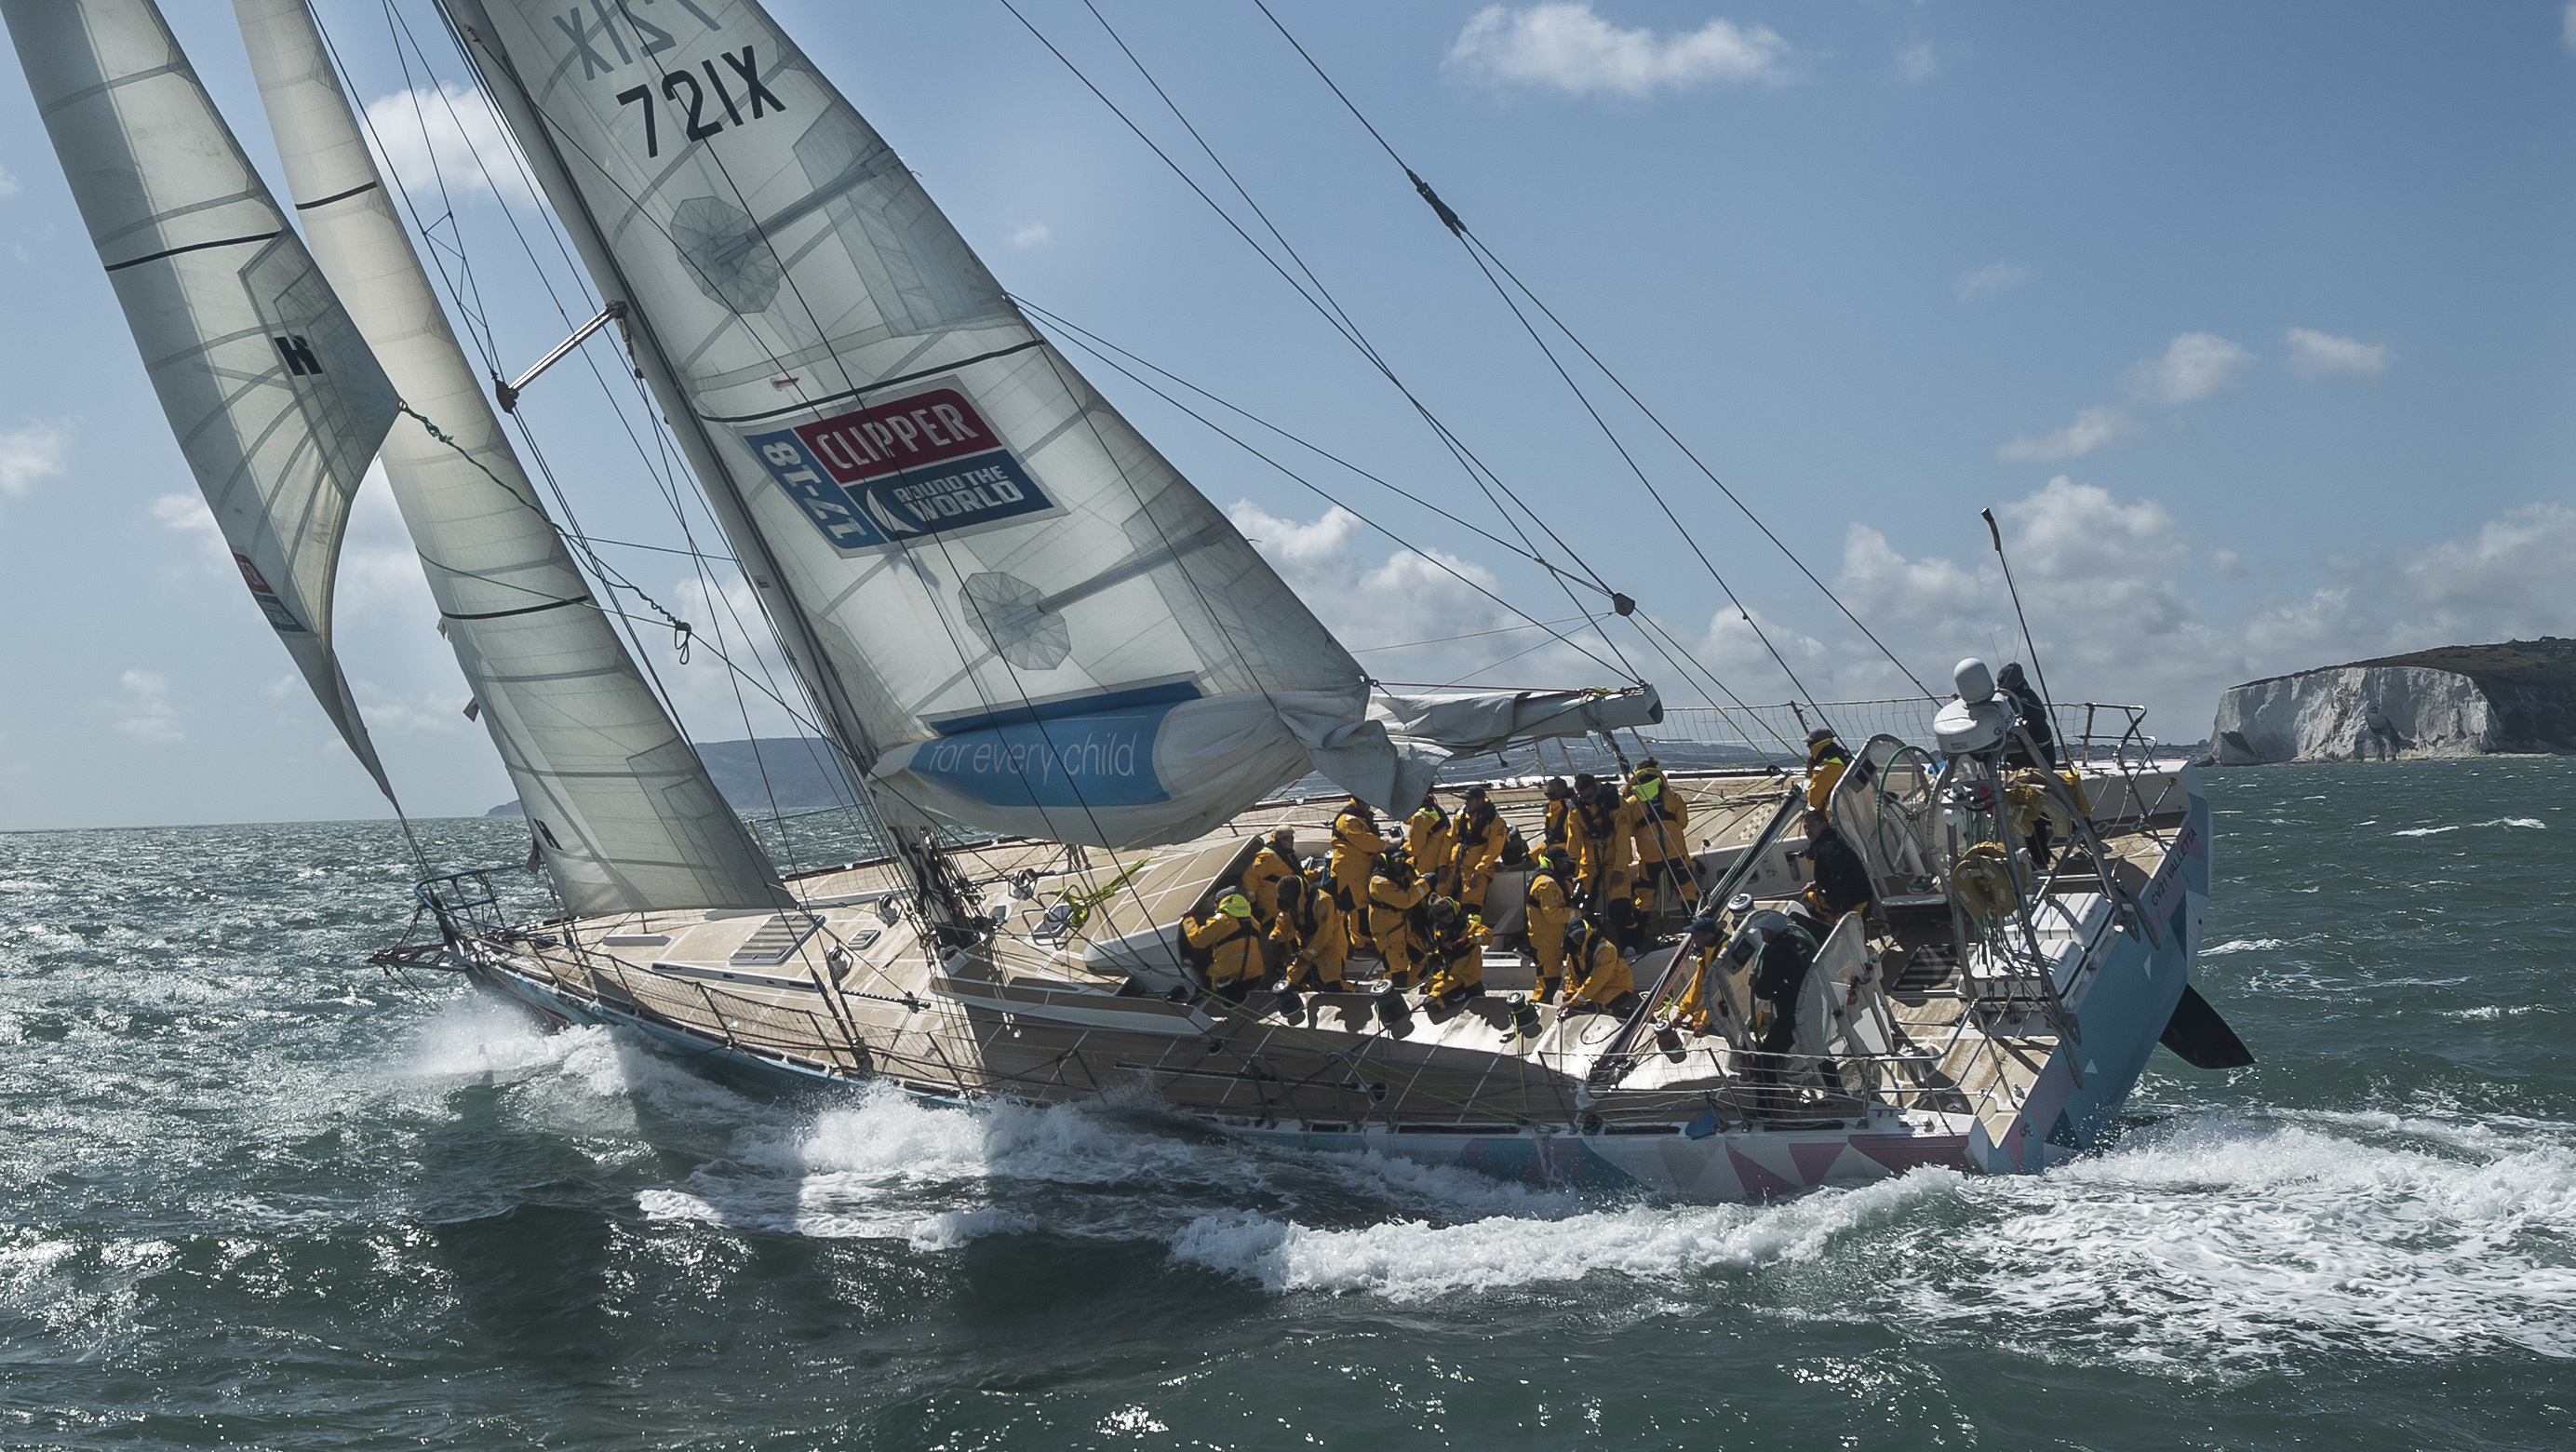 A Clipper Yacht race boat on the ocean